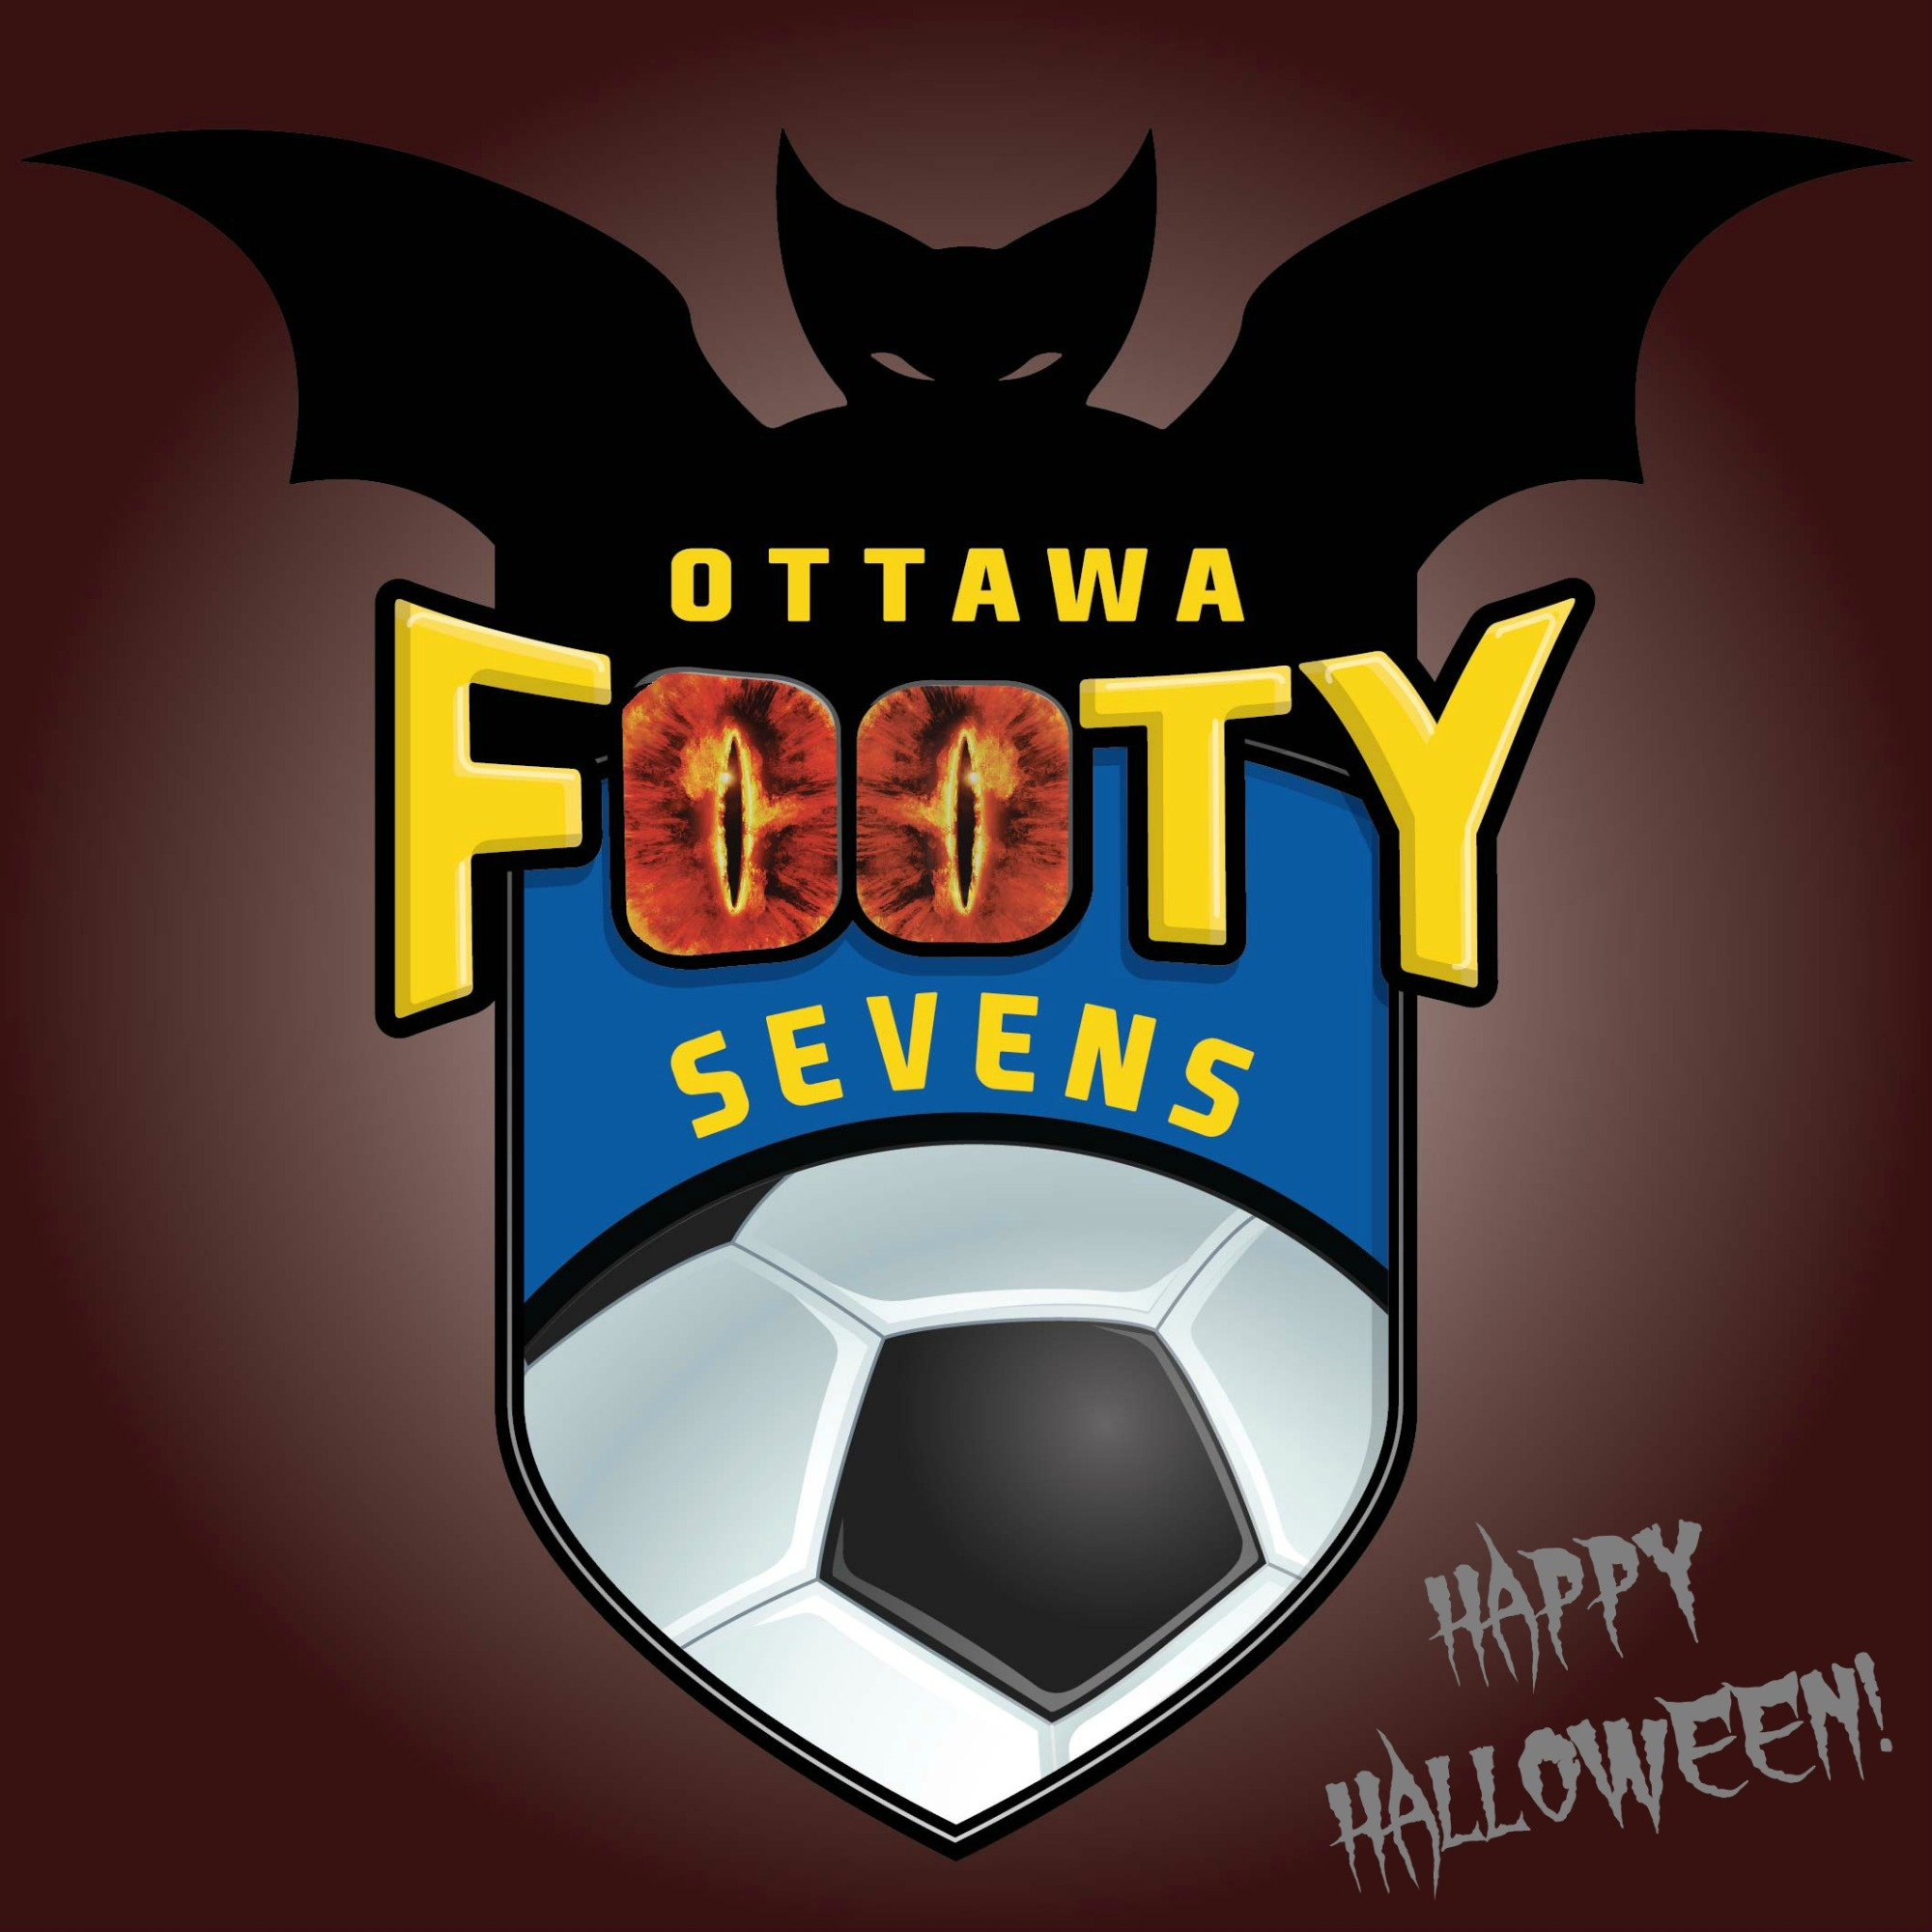 Footy Sevens Halloween